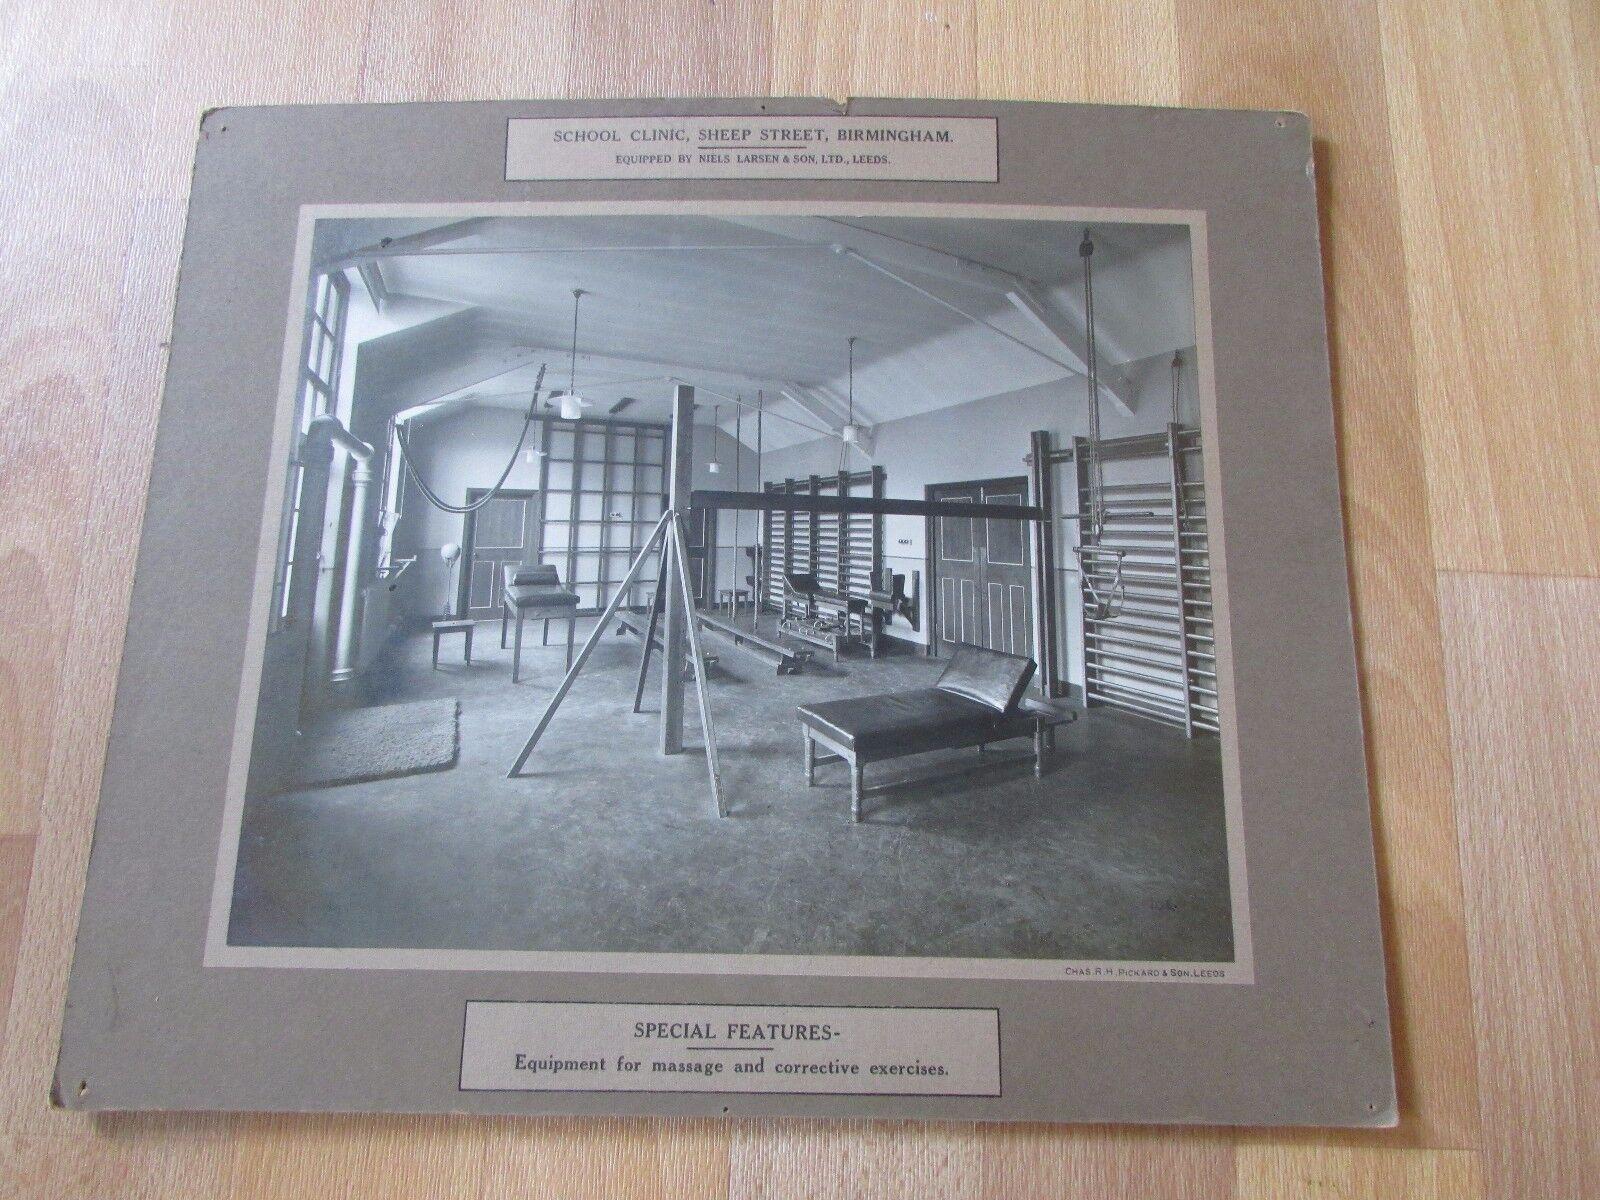 School Clinic Sheep Street BIRMINGHAM Original Exercise Room Photo by Makers